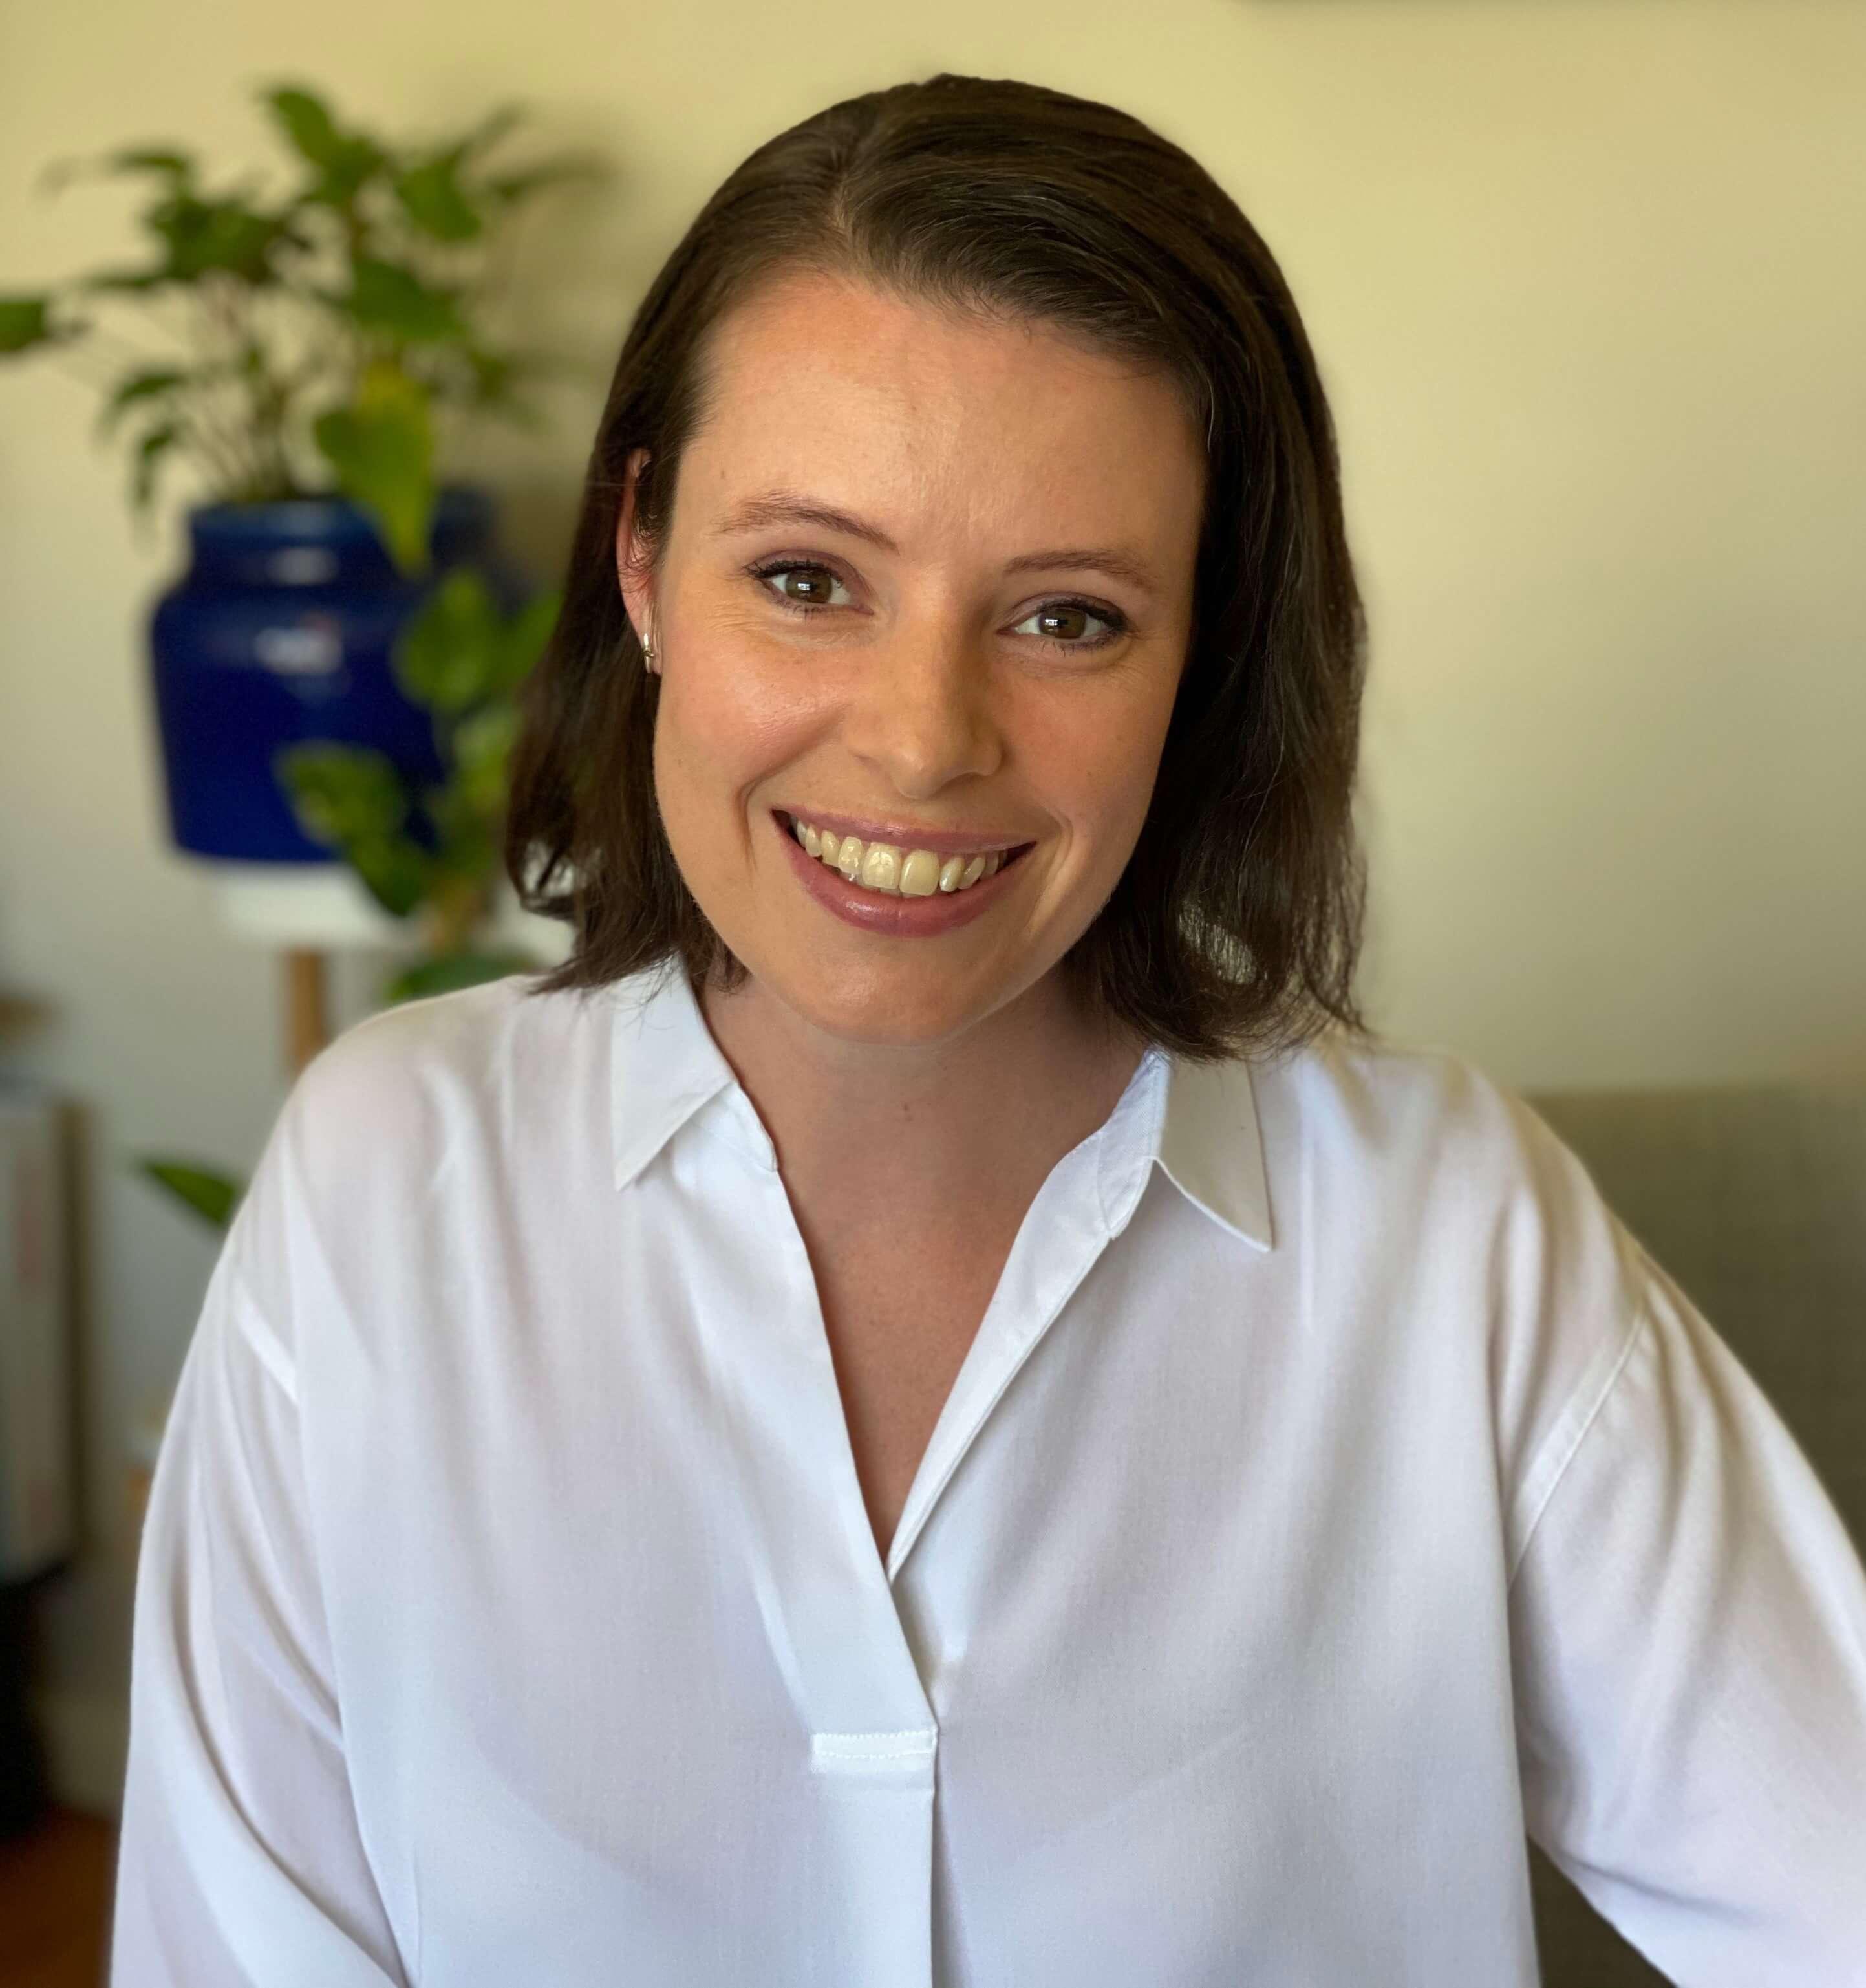 Daisy Prowse joins East Neurology